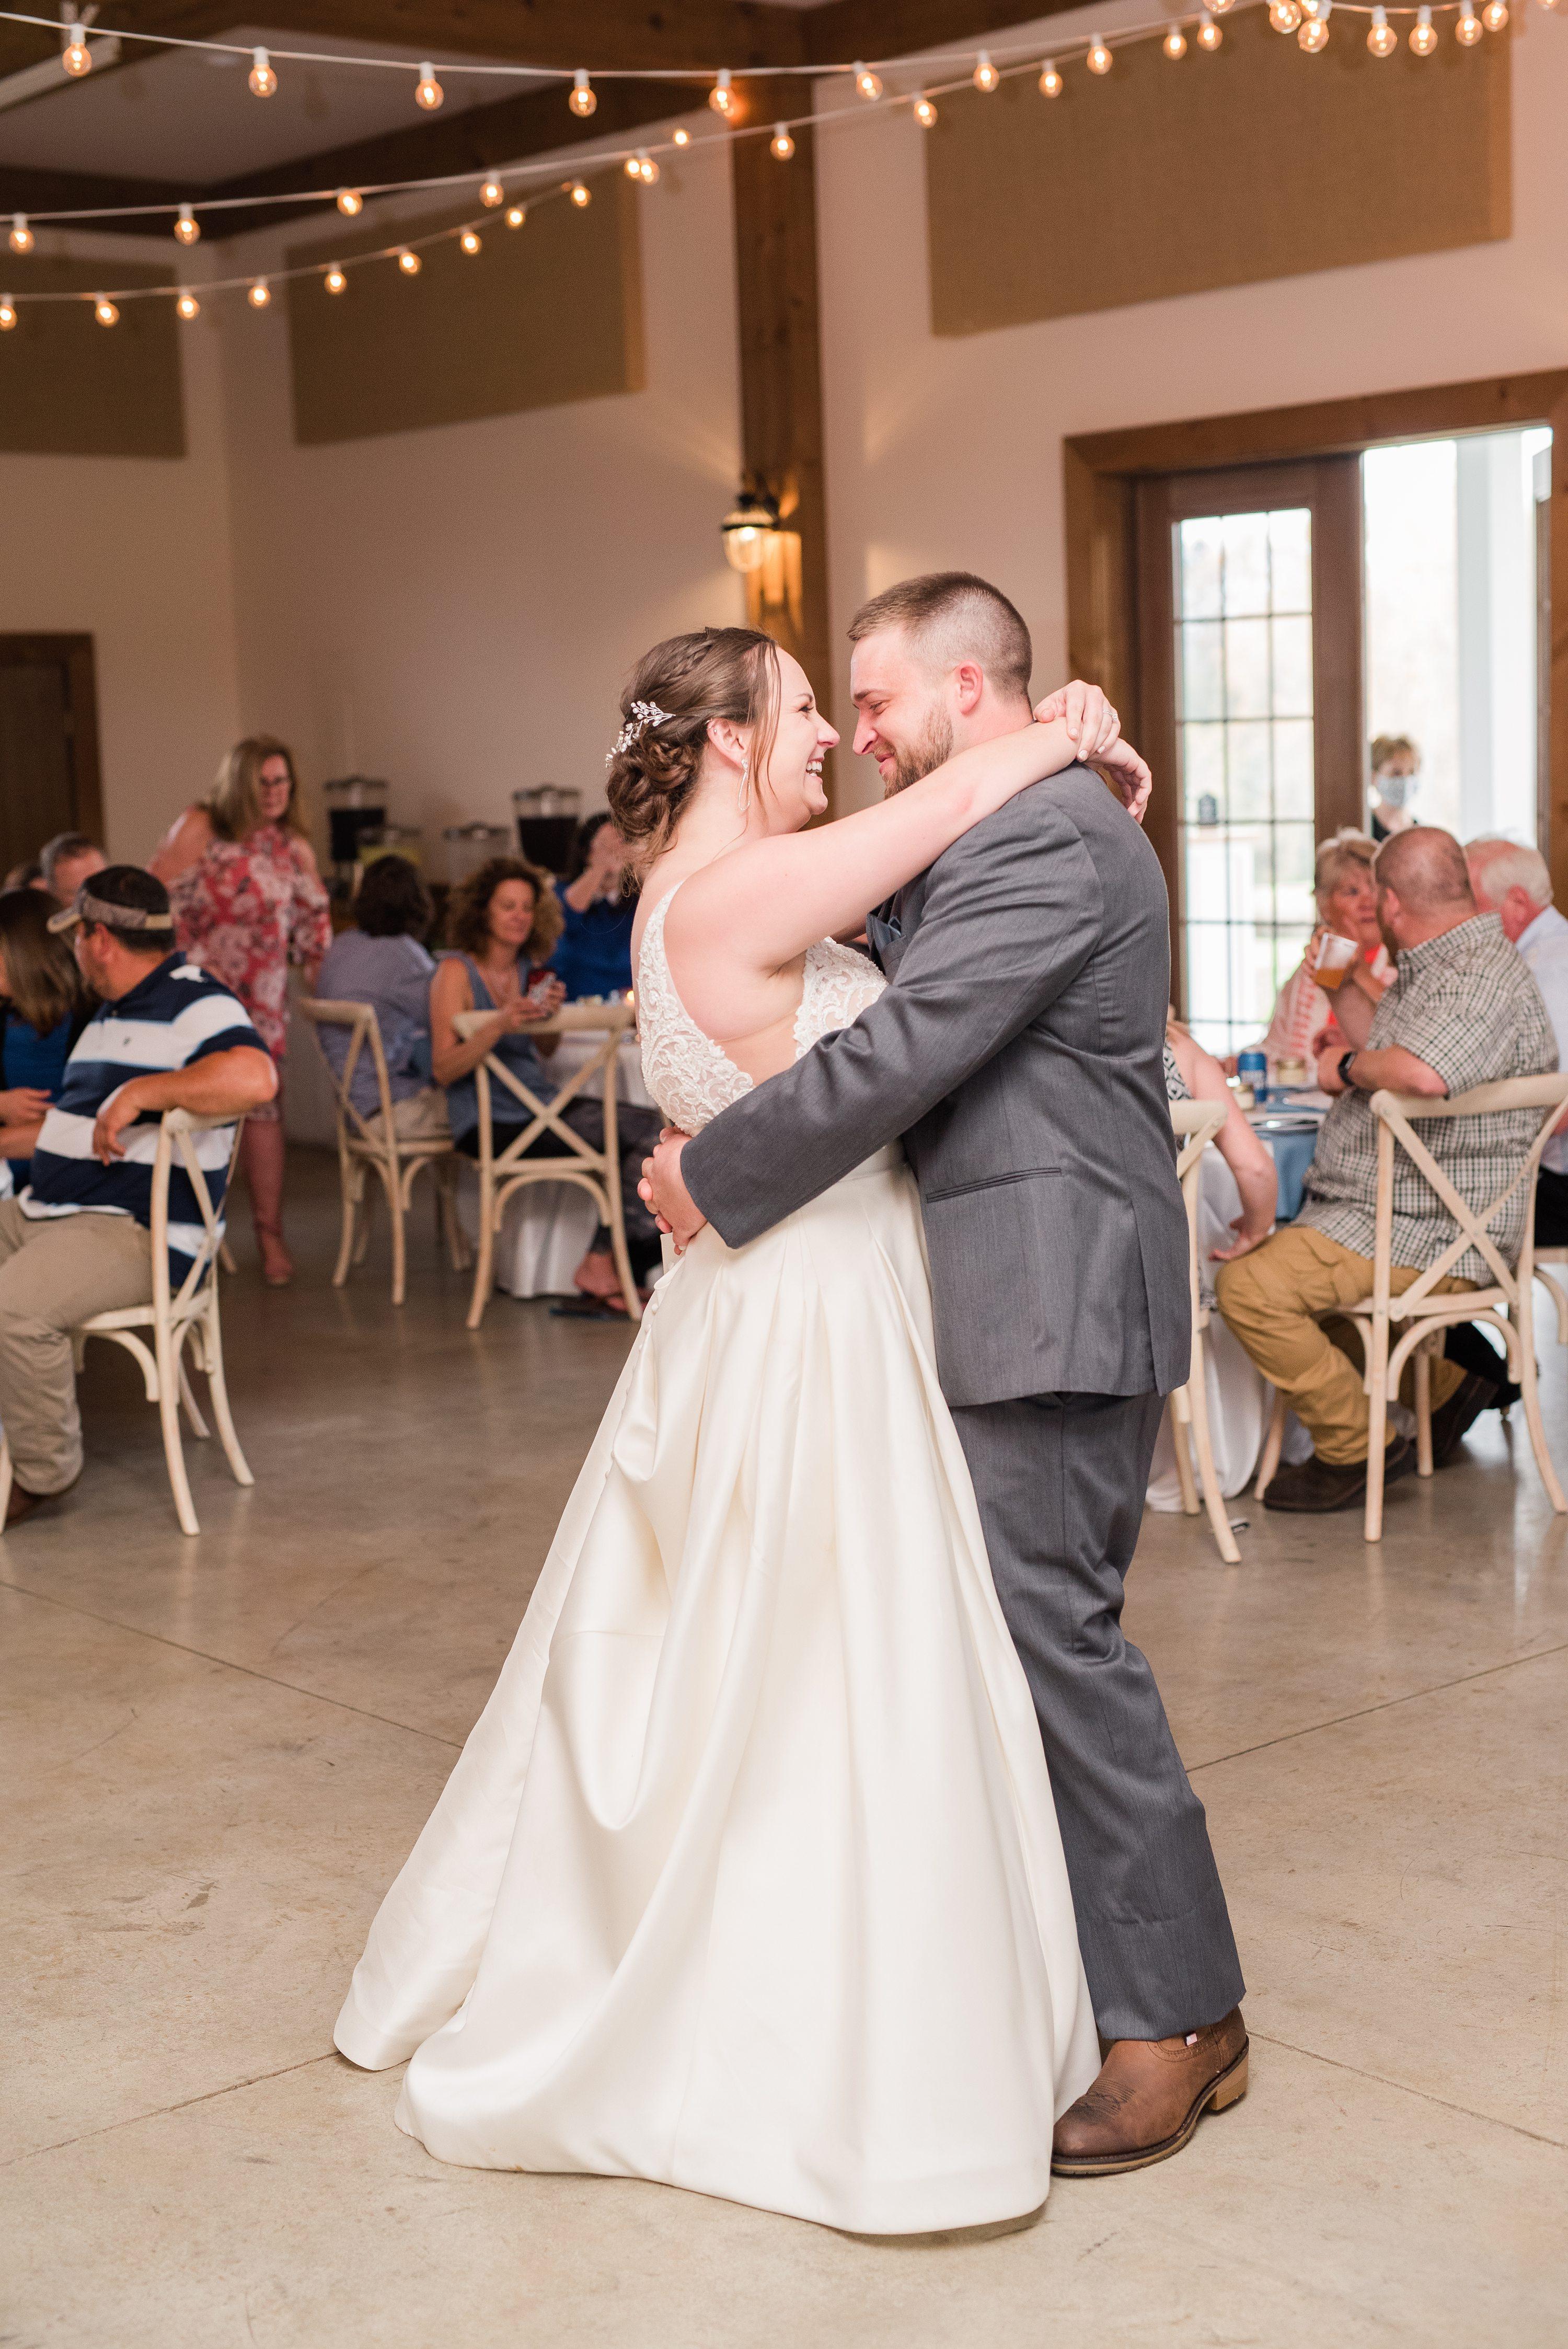 Spring,Barn,reception,bride and groom,edgewood barn